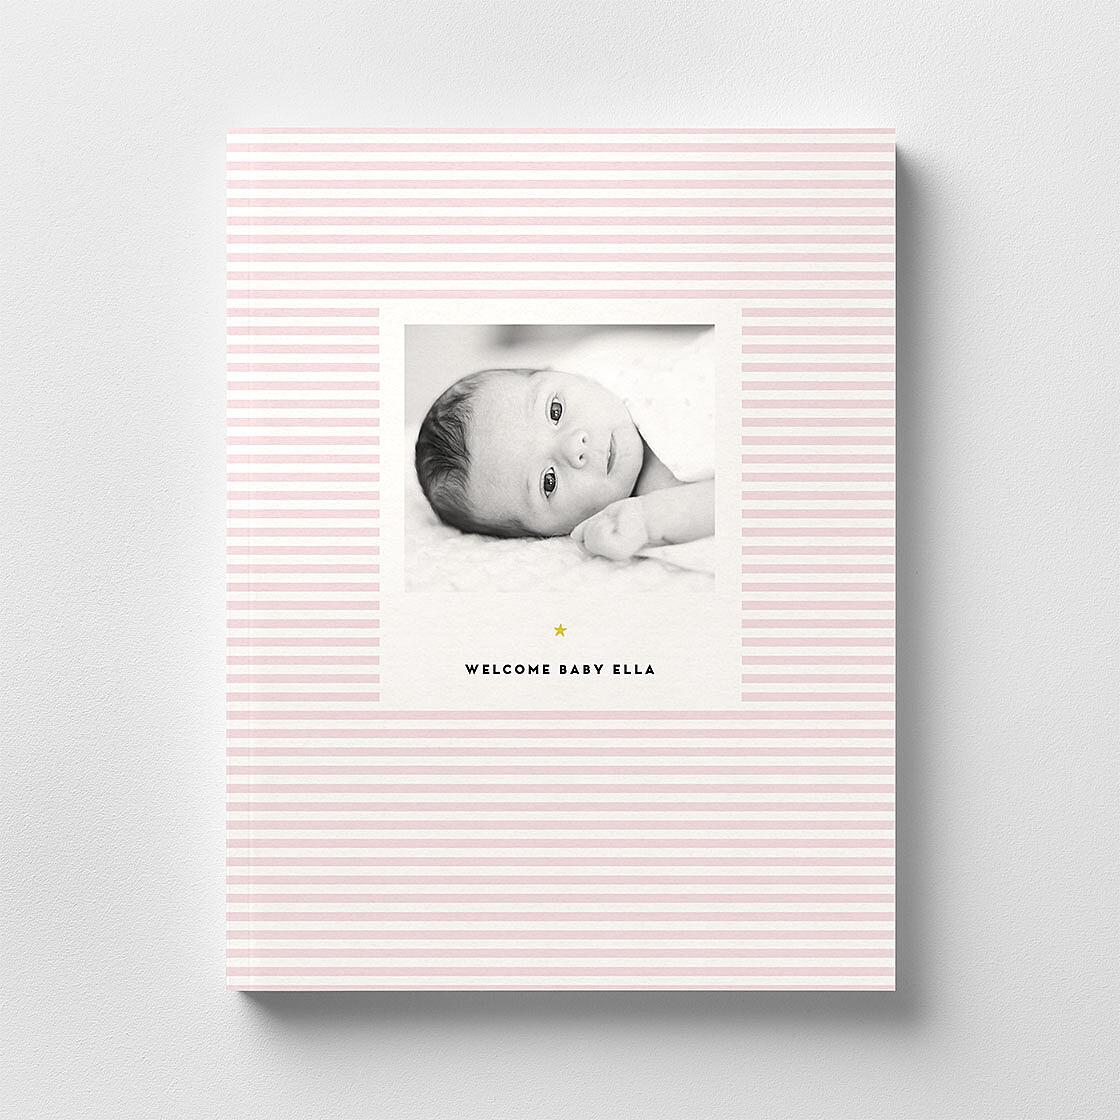 Create Personalised Photo Albums Online Rosemood